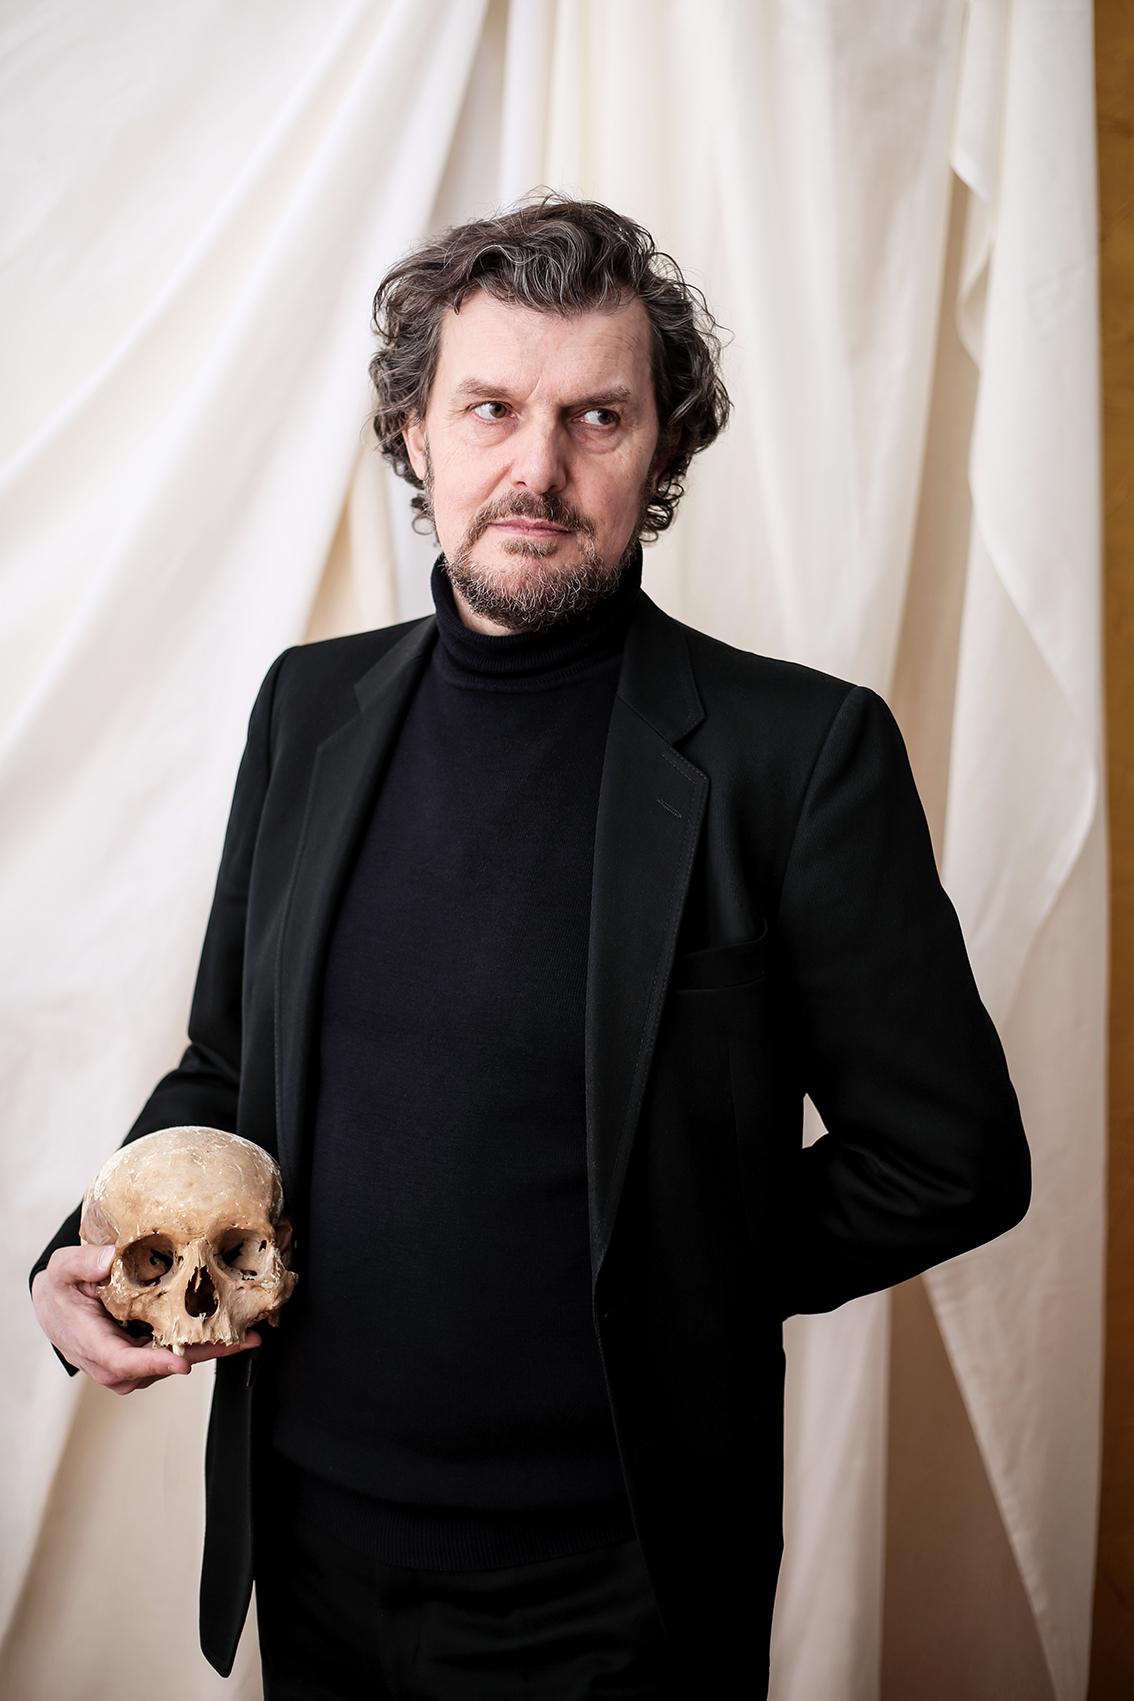 Christophe Berhault